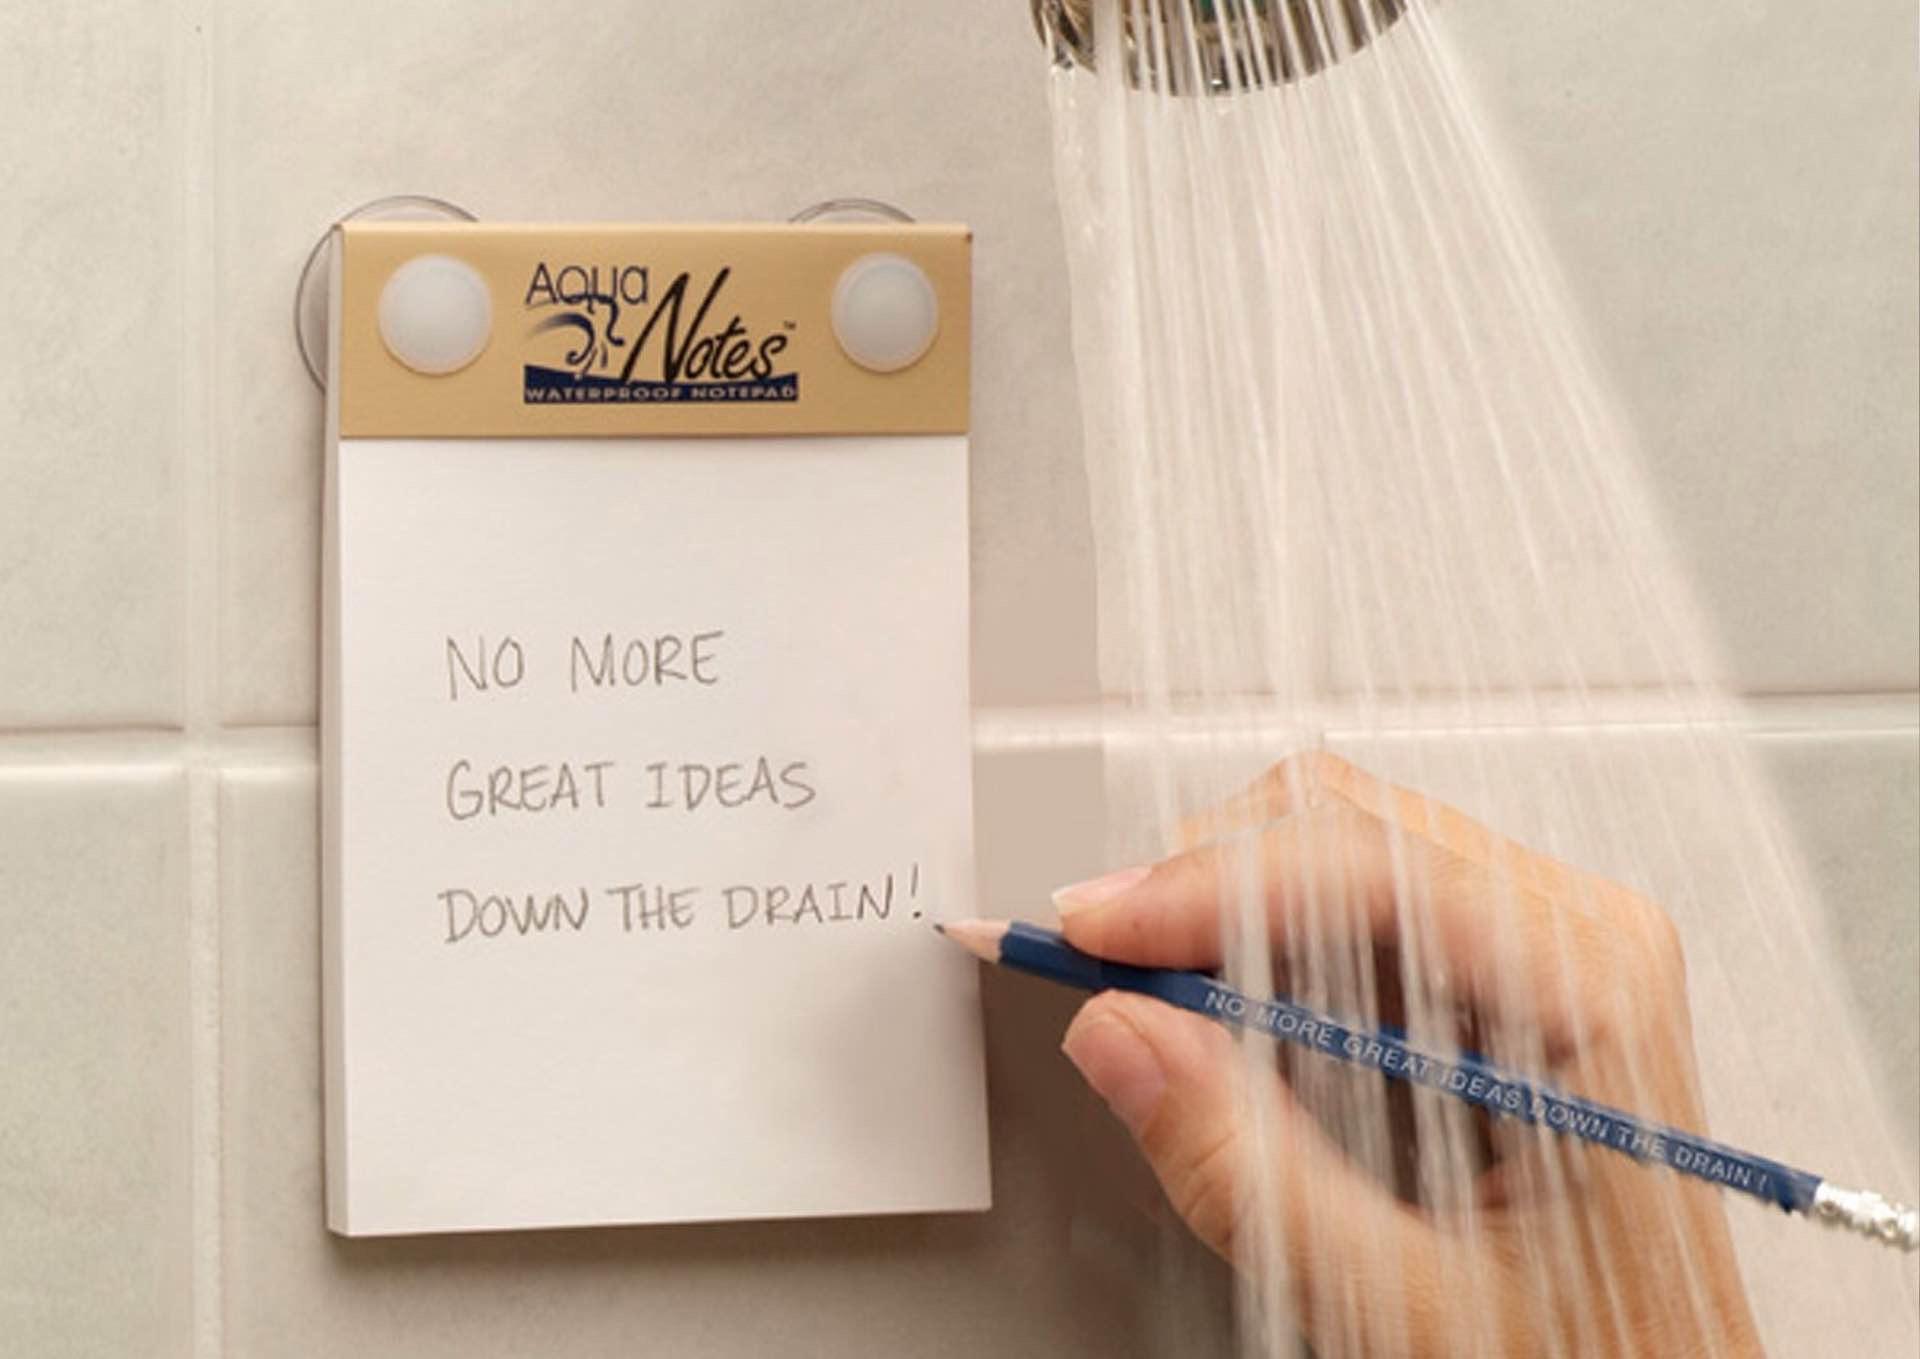 AquaNotes waterproof notepad. ($9)